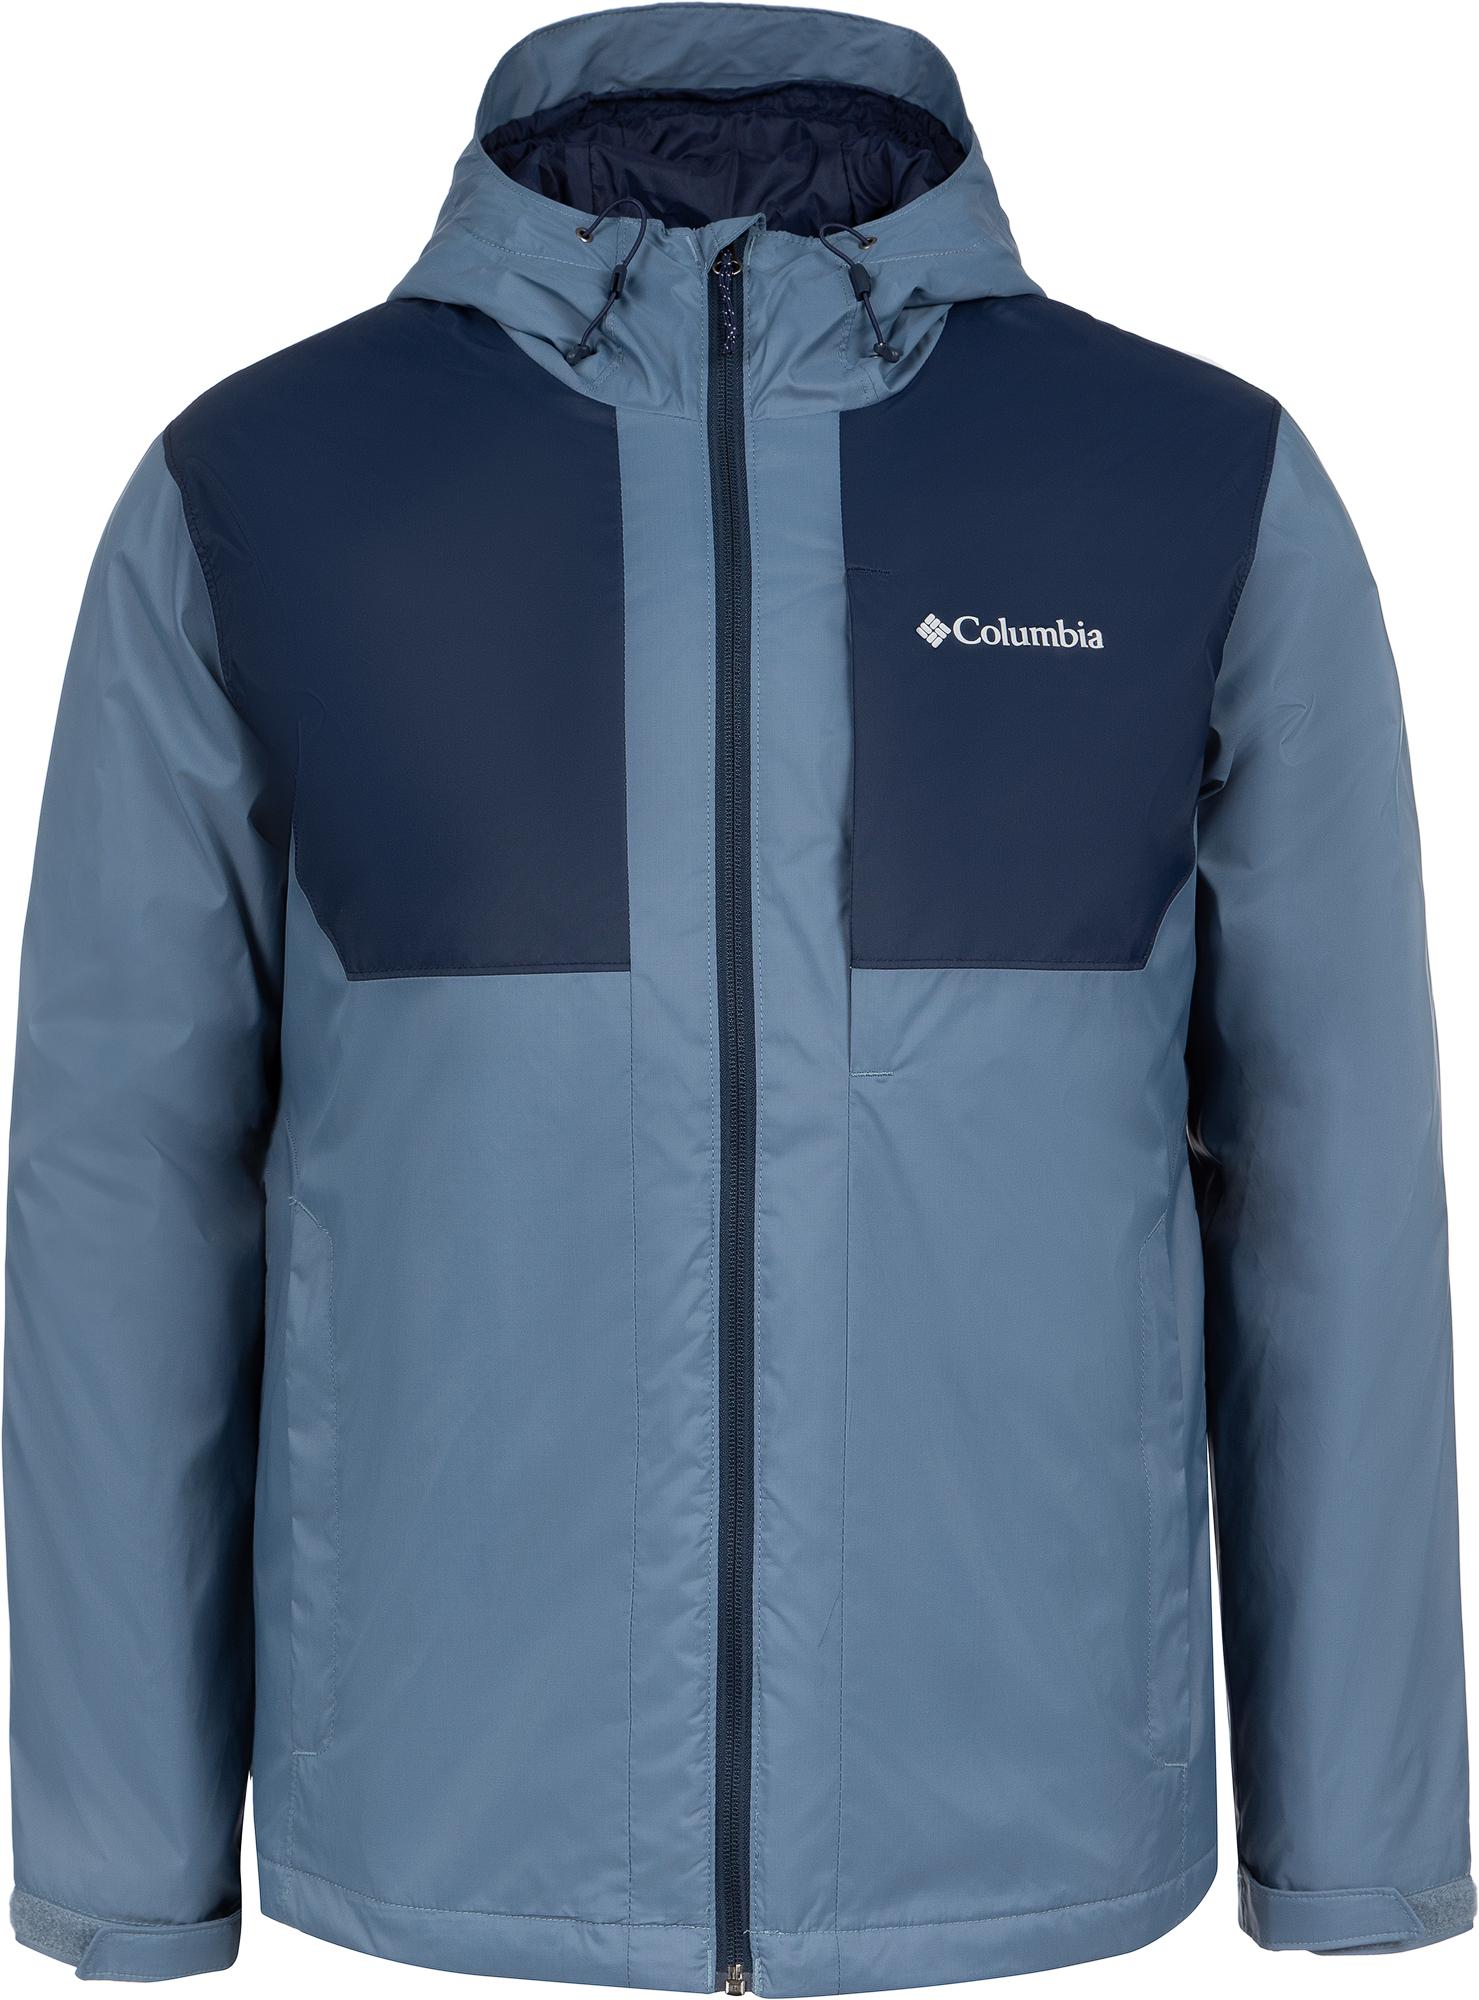 Columbia Куртка утепленная мужская Columbia Straight Line™, размер 50-52